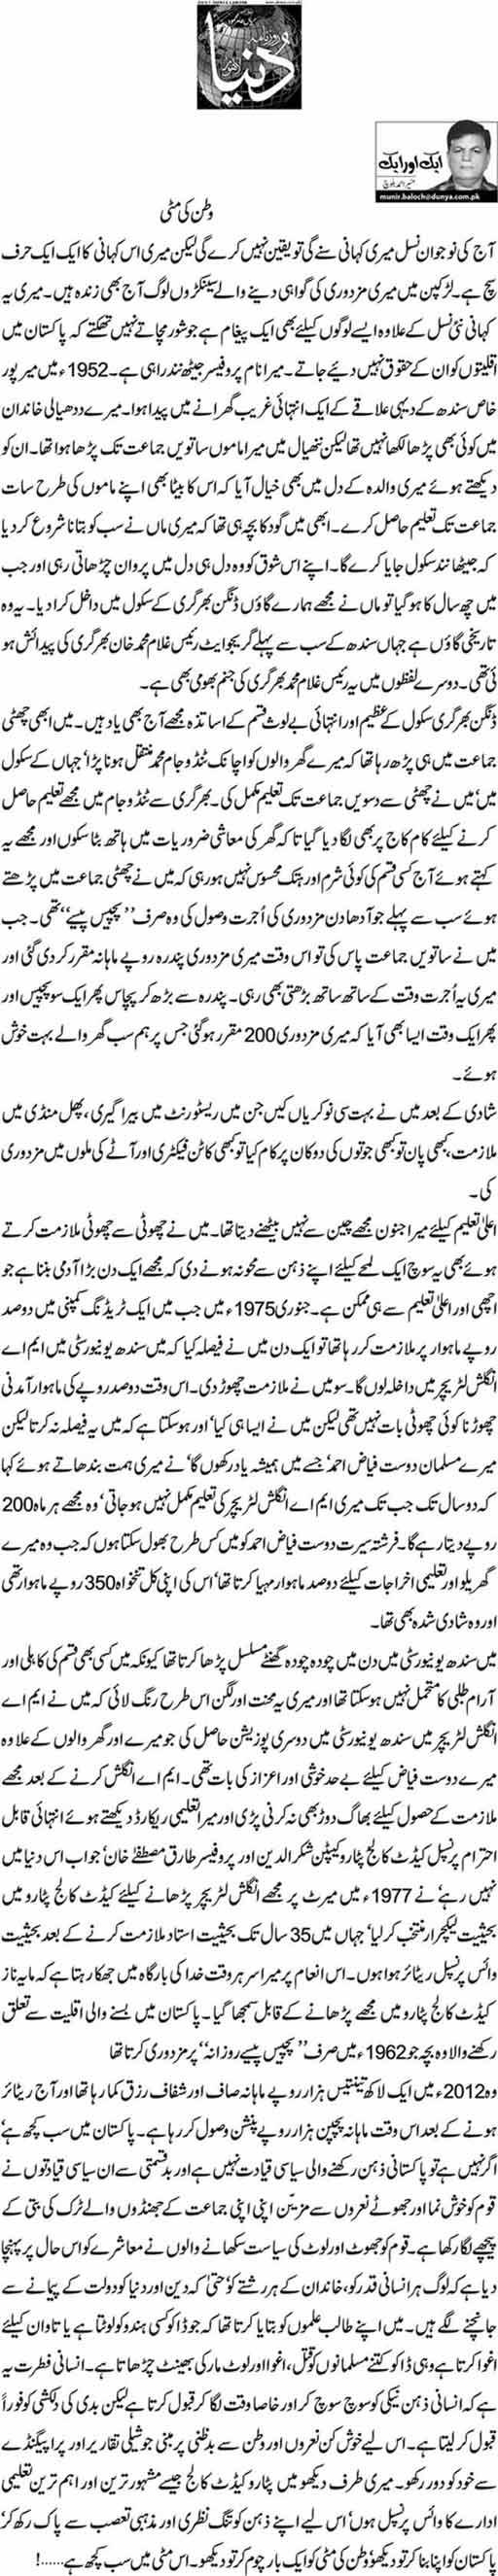 Watan ki Matti - Munir Ahmed Baloch